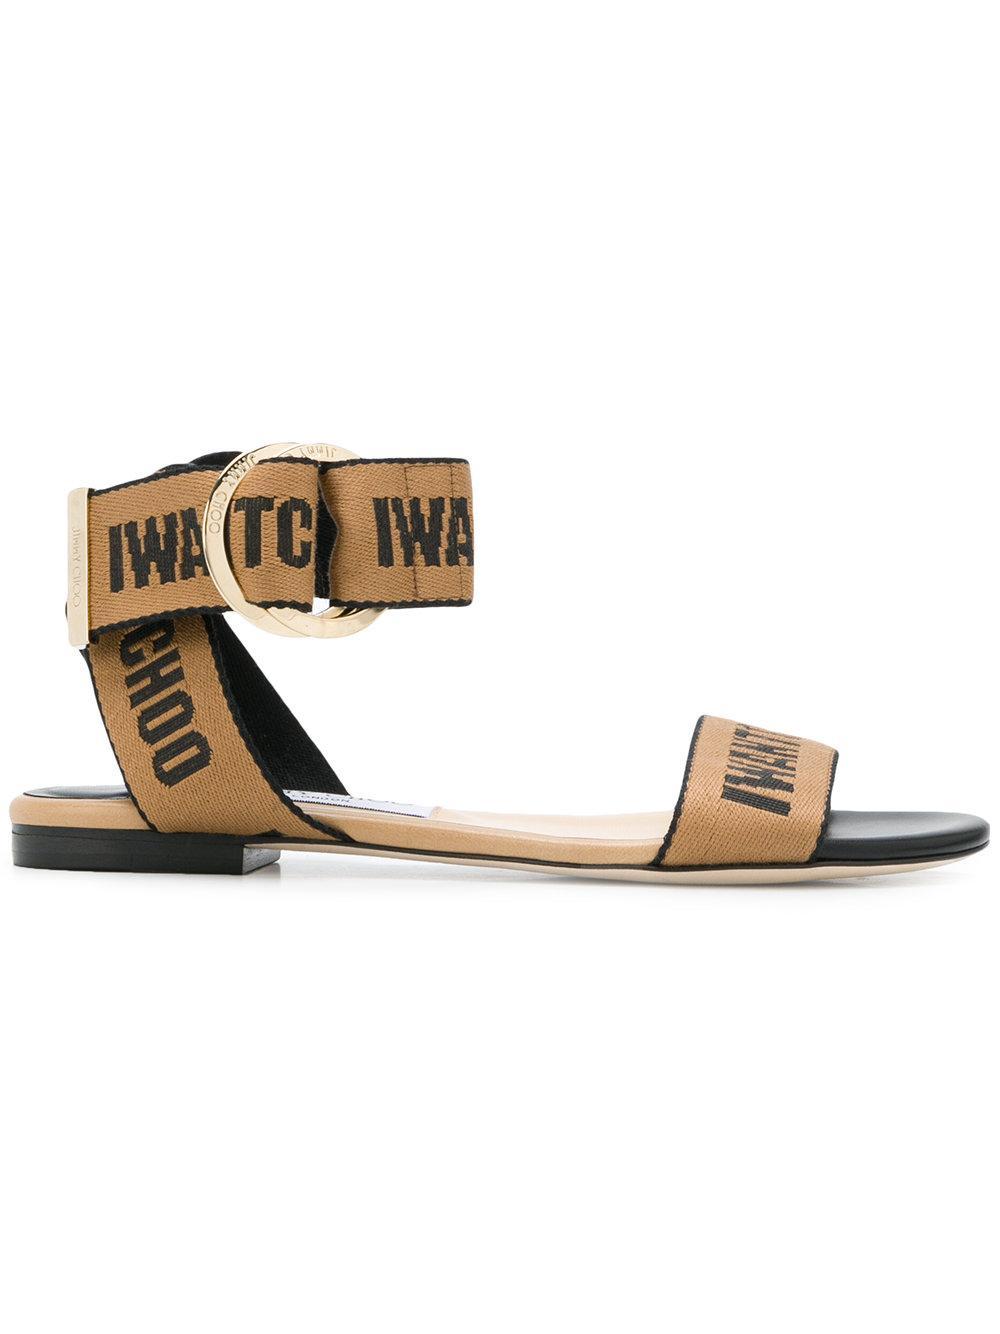 6775eaa45a7d Jimmy Choo Breanne Flat Sandals - Neutrals